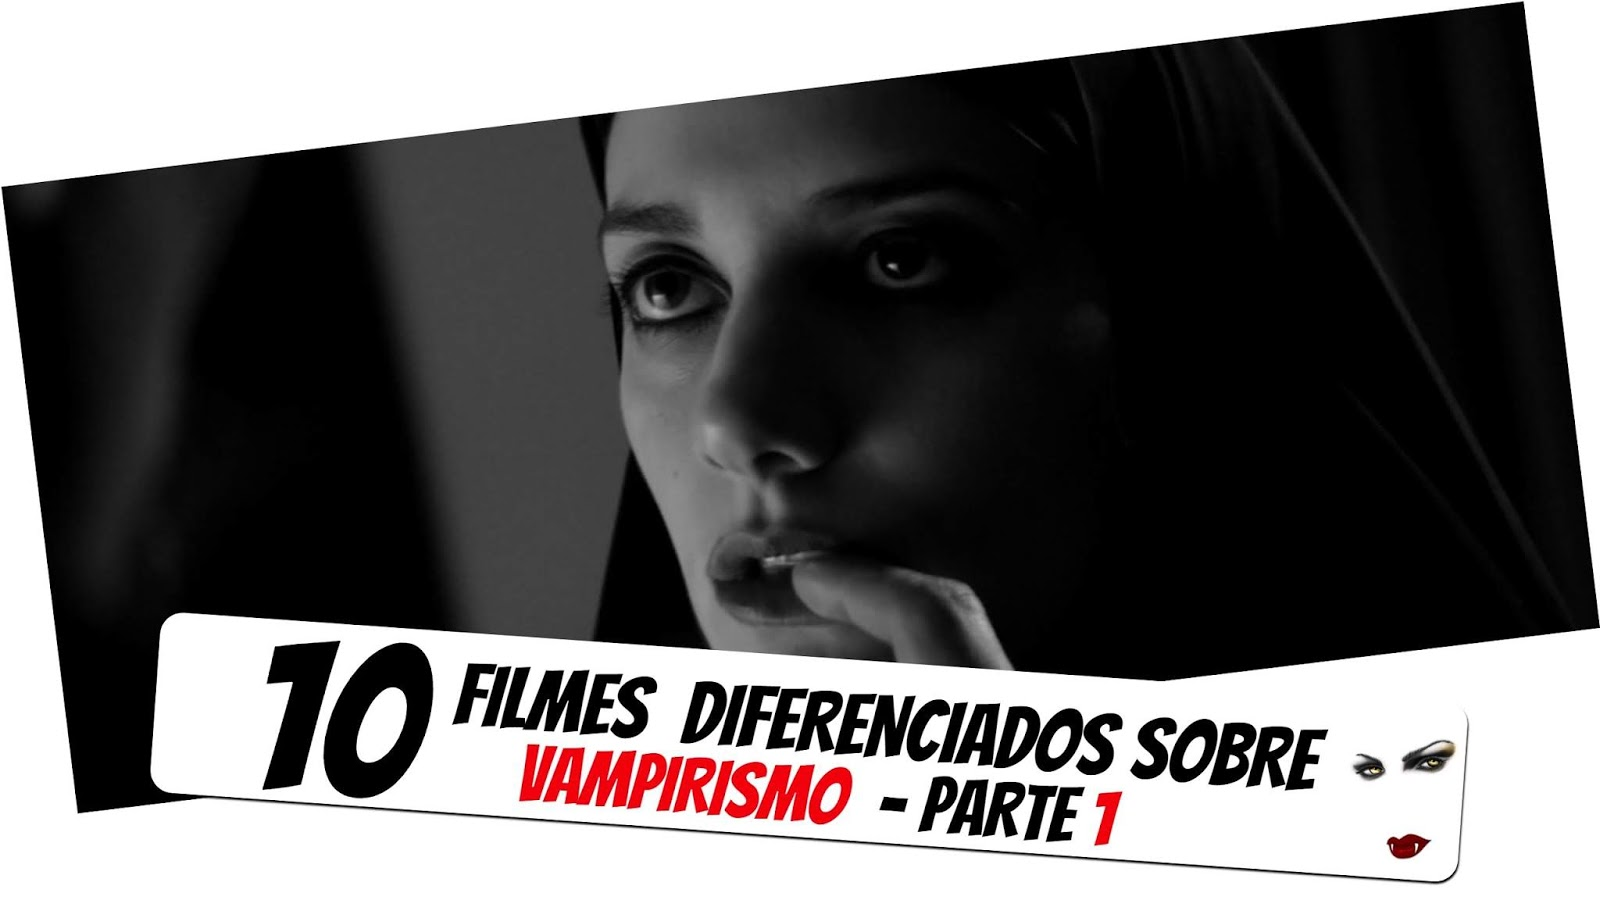 10-filmes-sobre-vampirismo